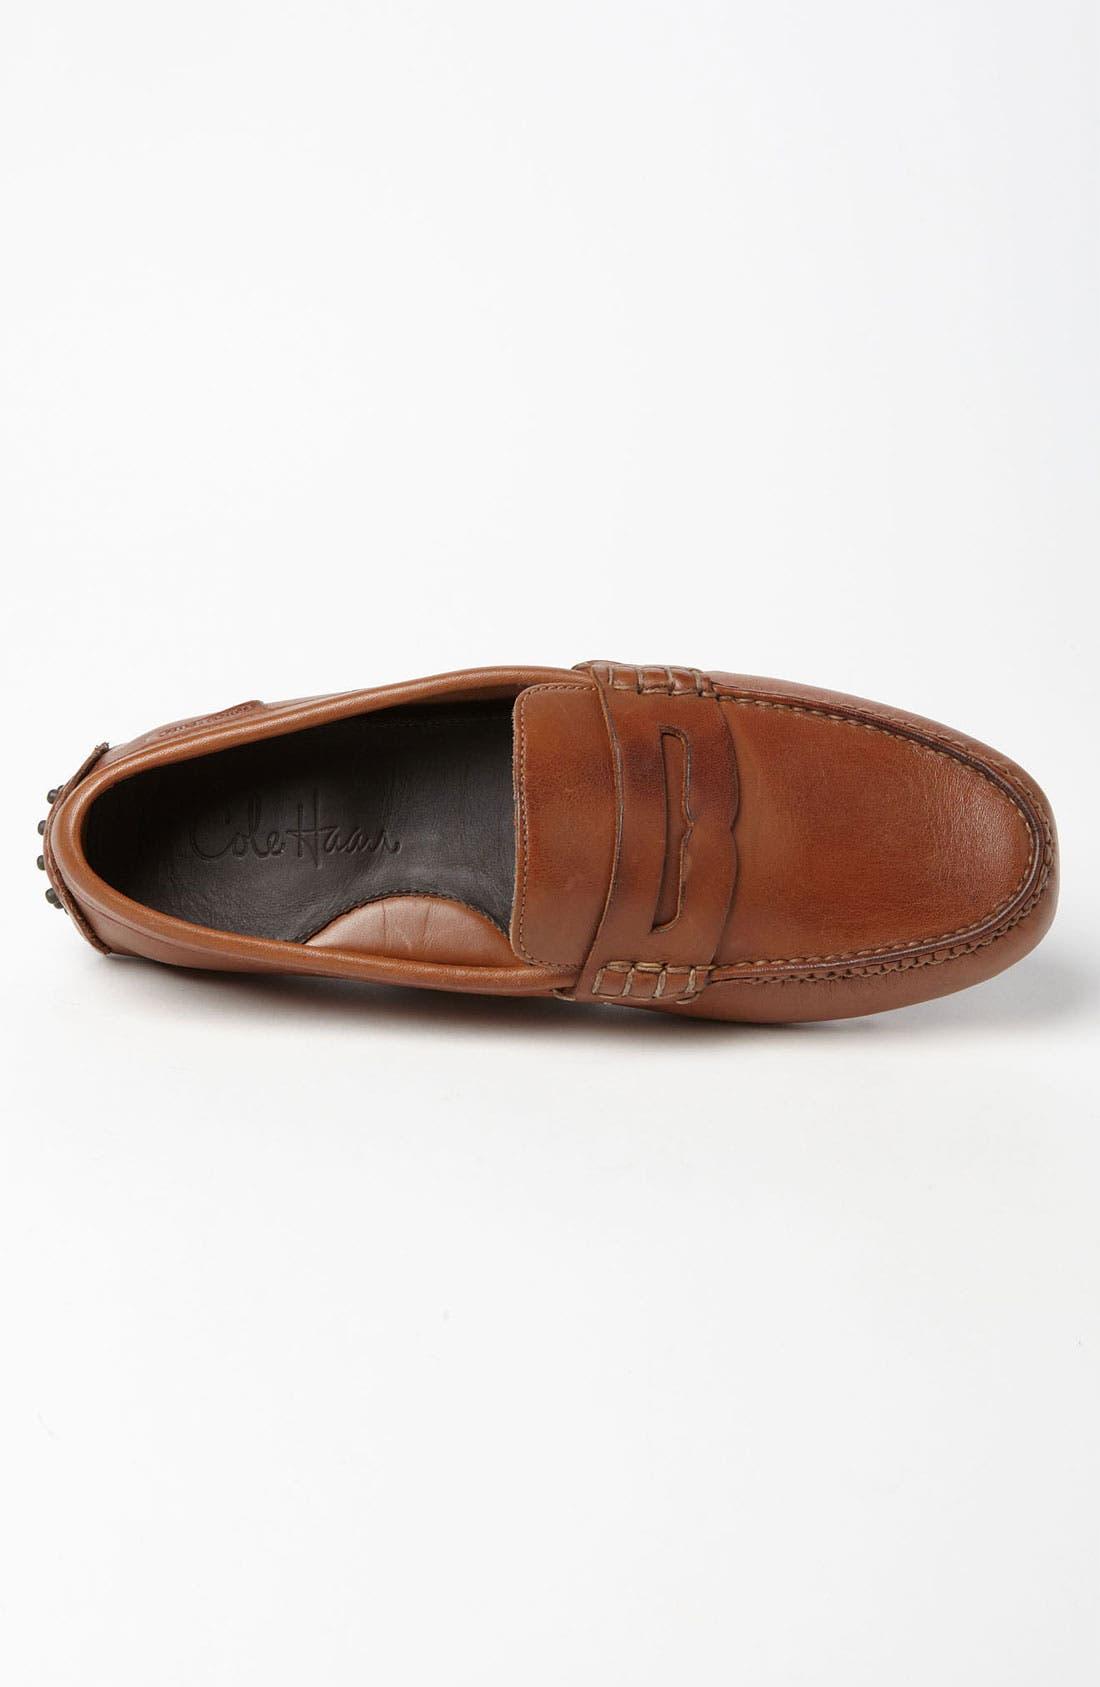 Alternate Image 3  - Cole Haan 'Air Grant' Driving Loafer (Men)